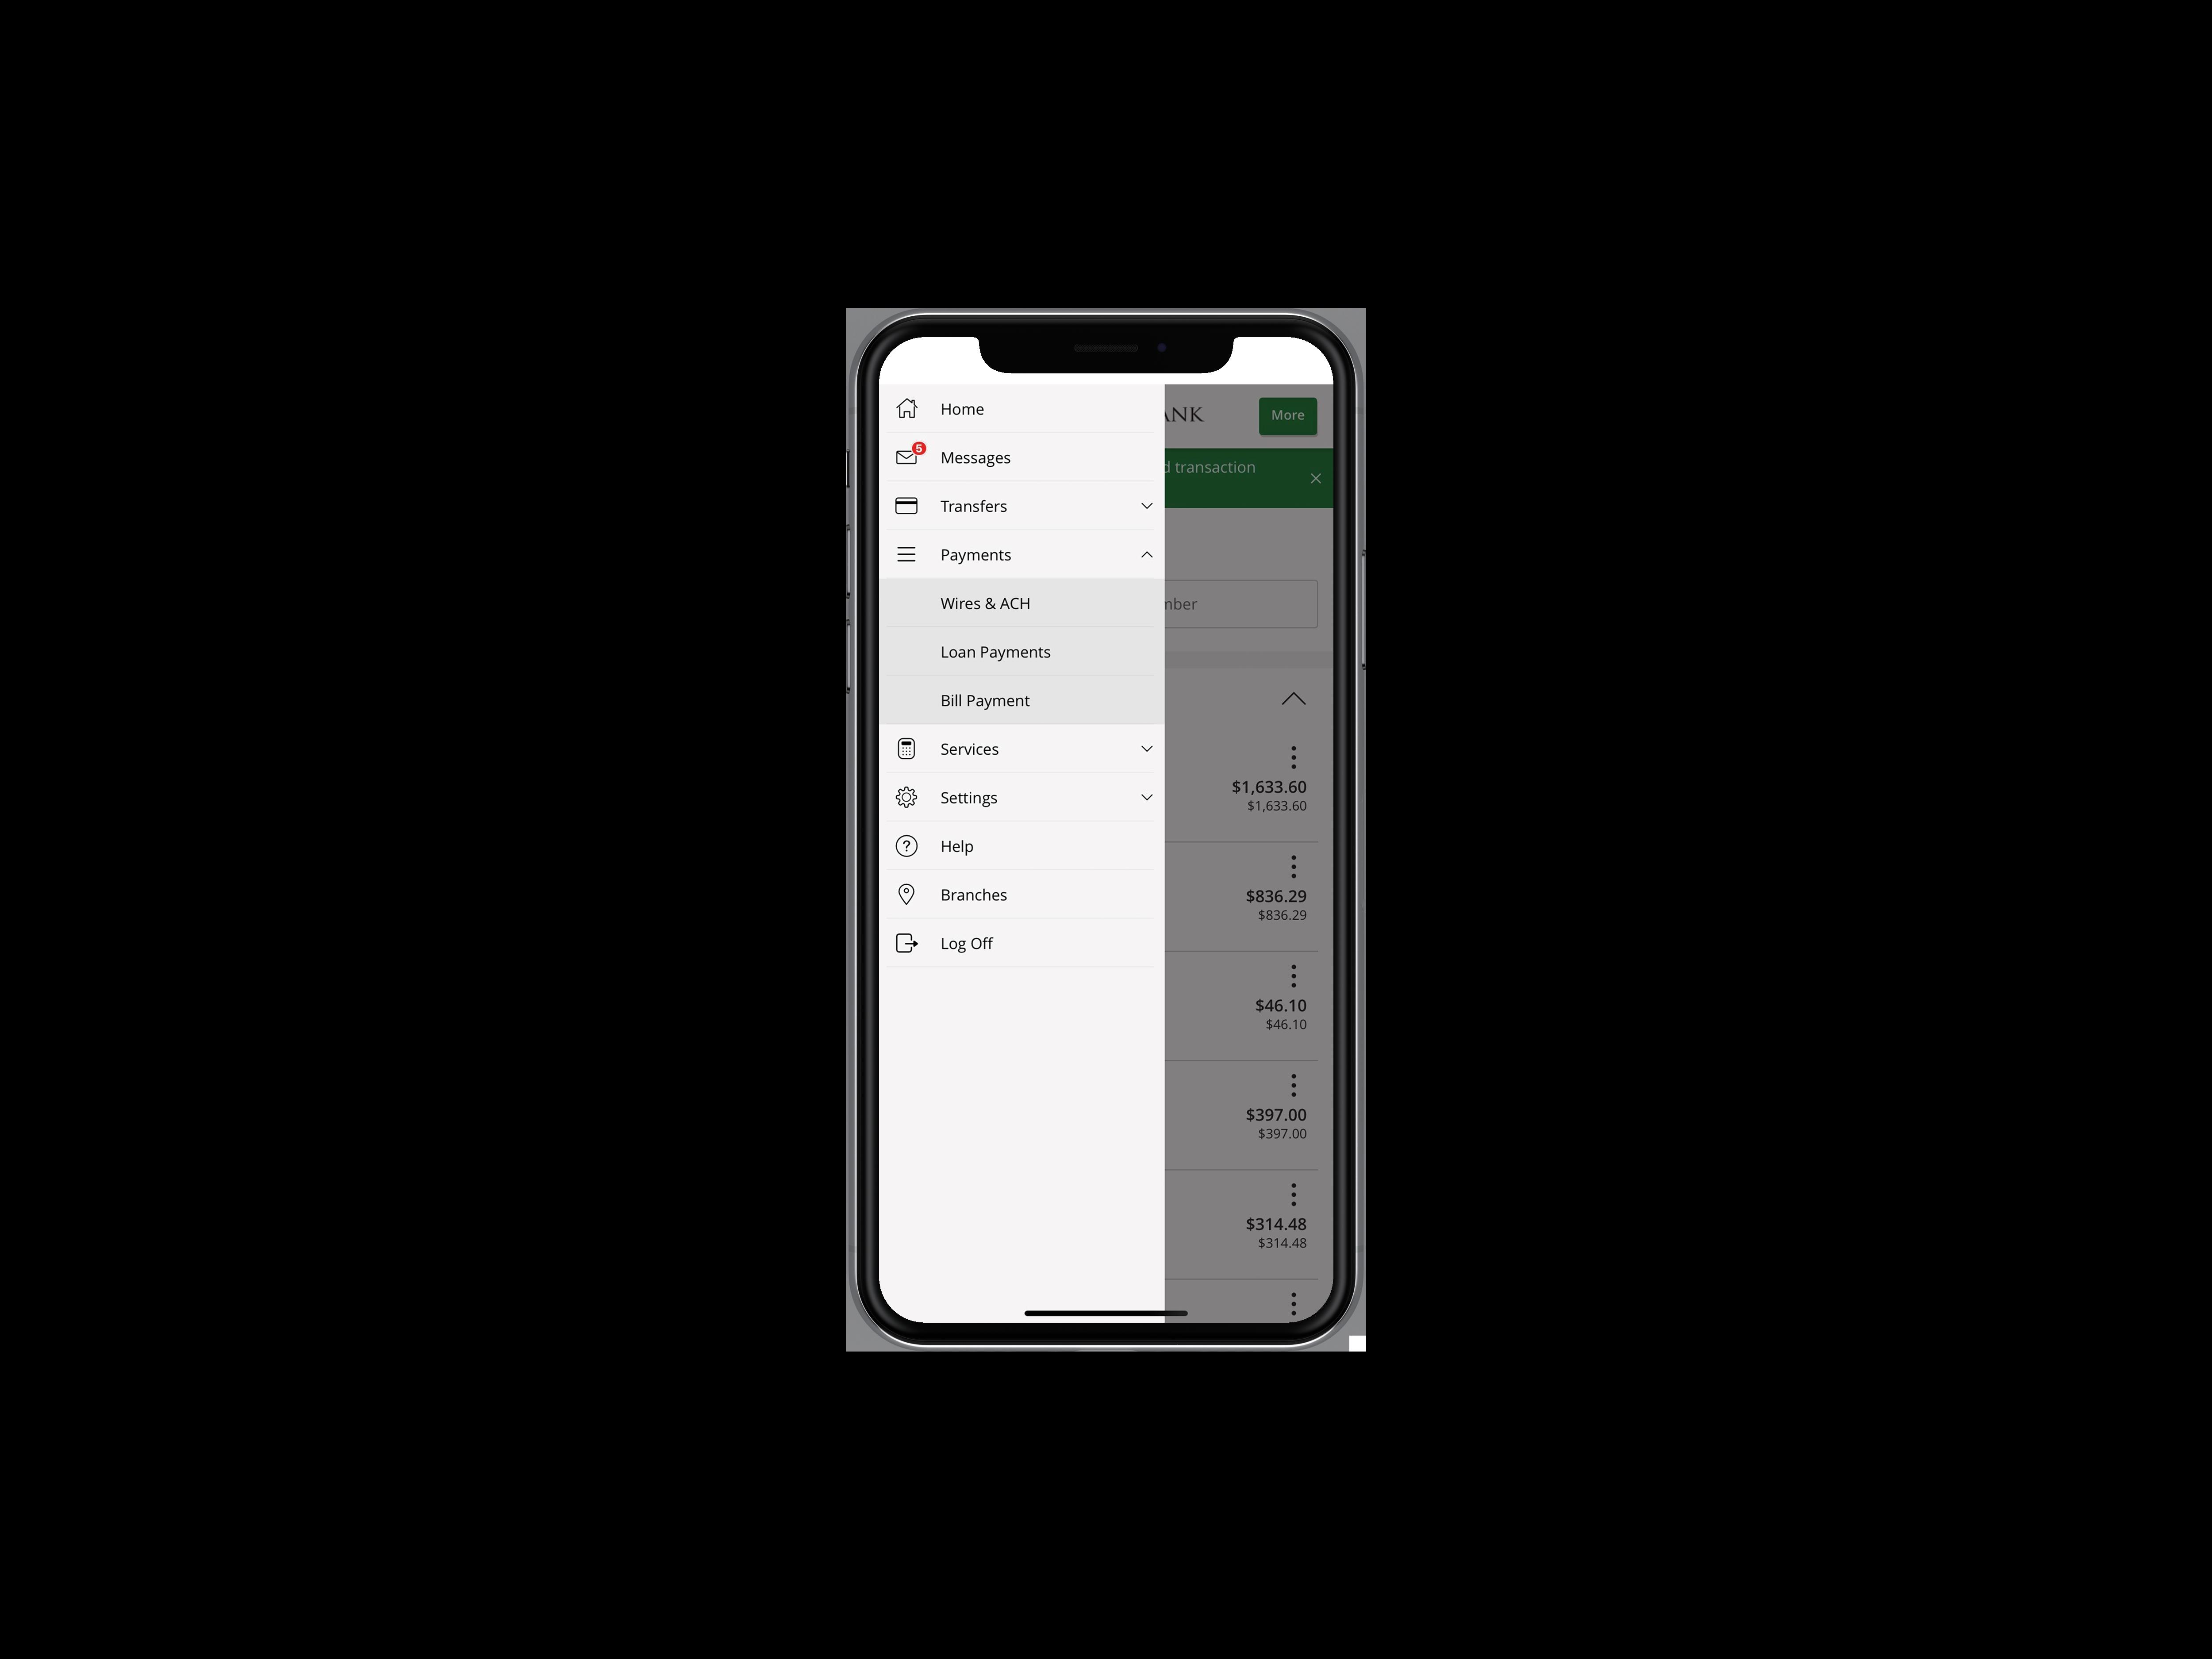 Phone with Digital Banking menu